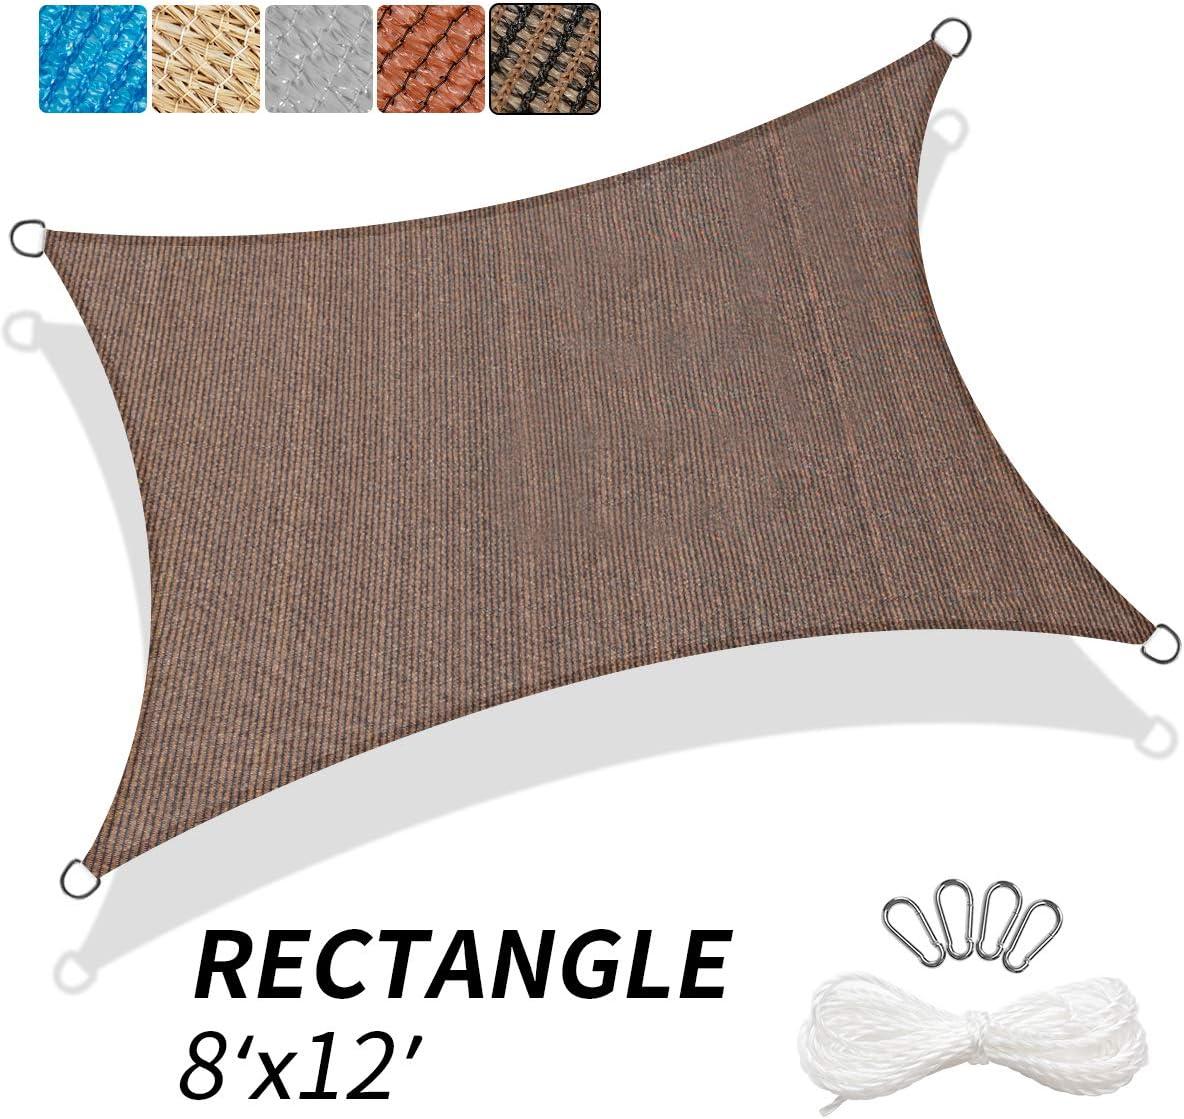 KITADIN 8 x12 Sun Shade Sail Rectangle Brown UV Block Awning Shelter Canopy for Outdoor Patio Garden Backyard